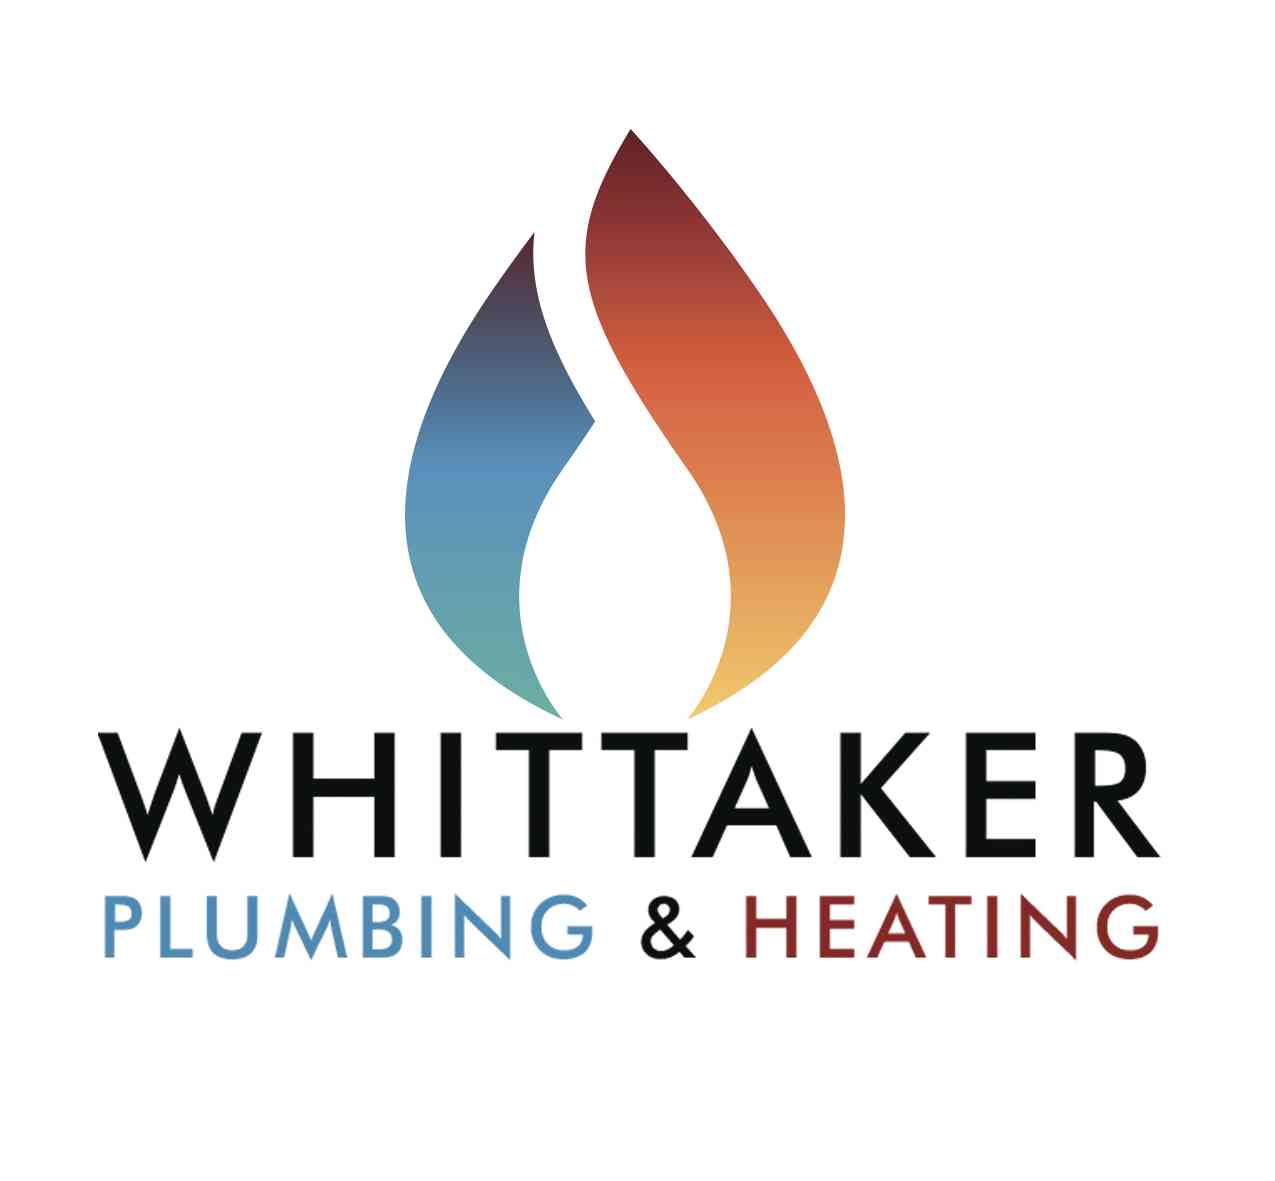 Whittaker Plumbing & Heating  Verified Logo